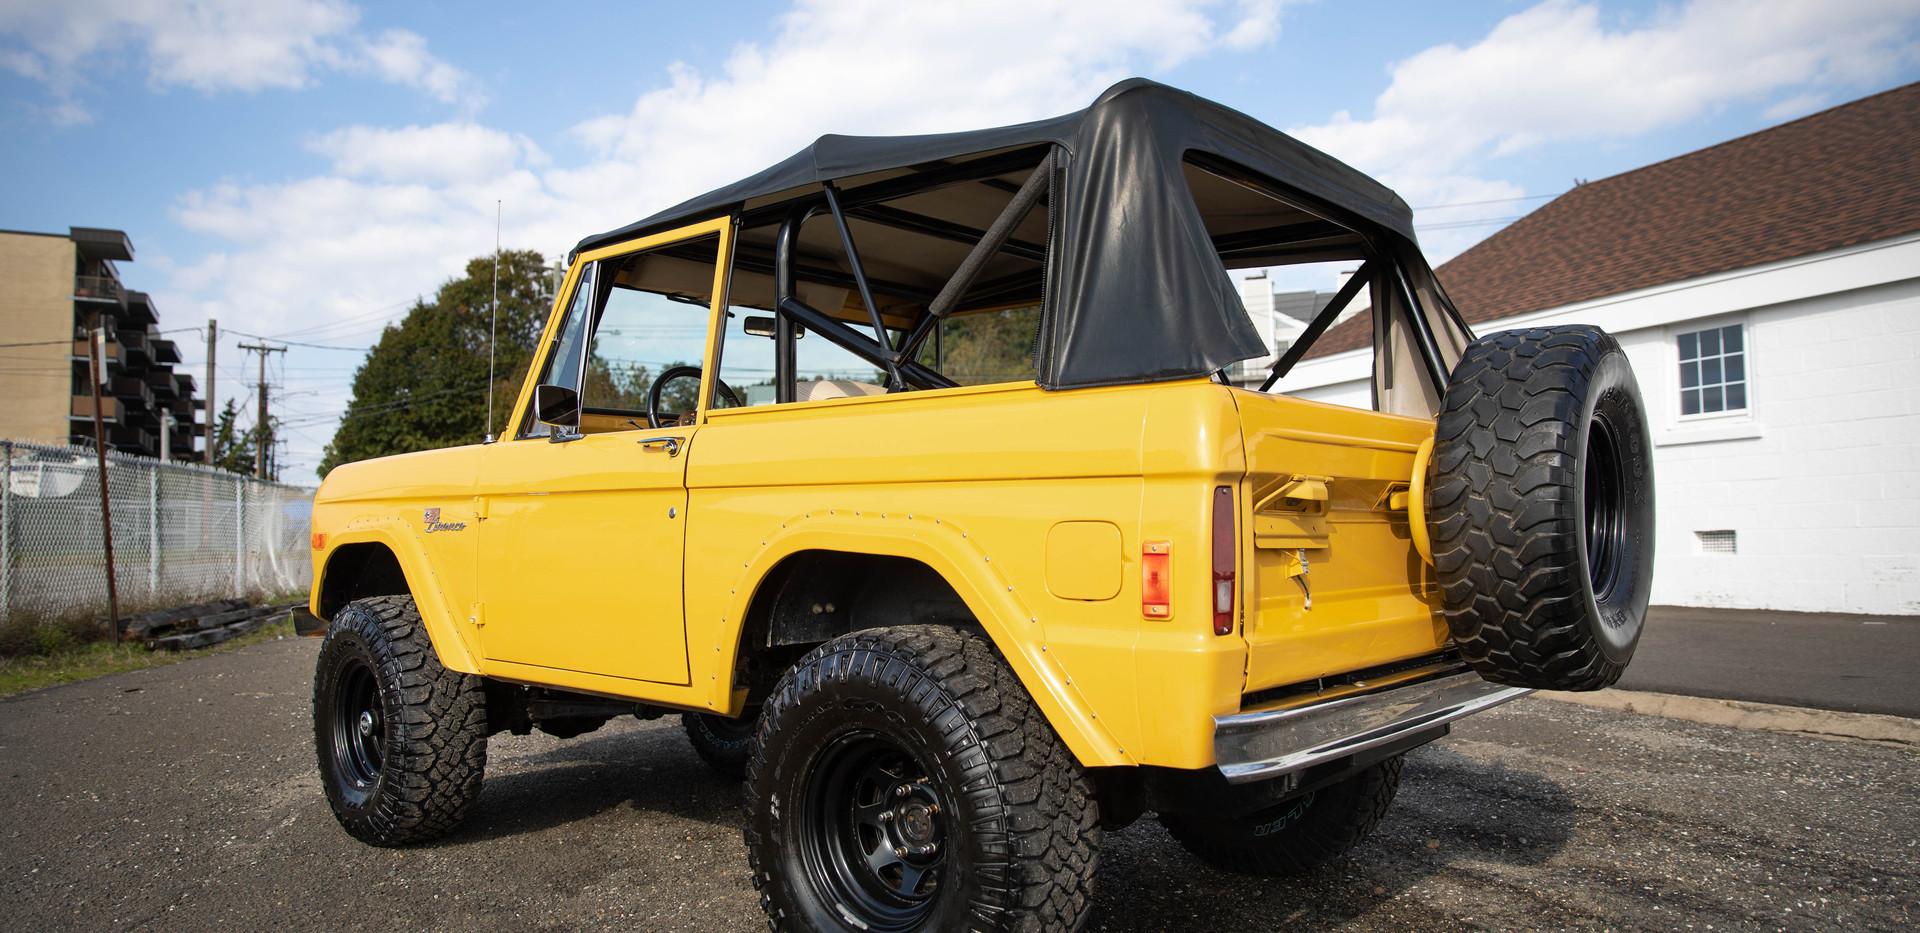 1977 Ford Bronco-12.jpg